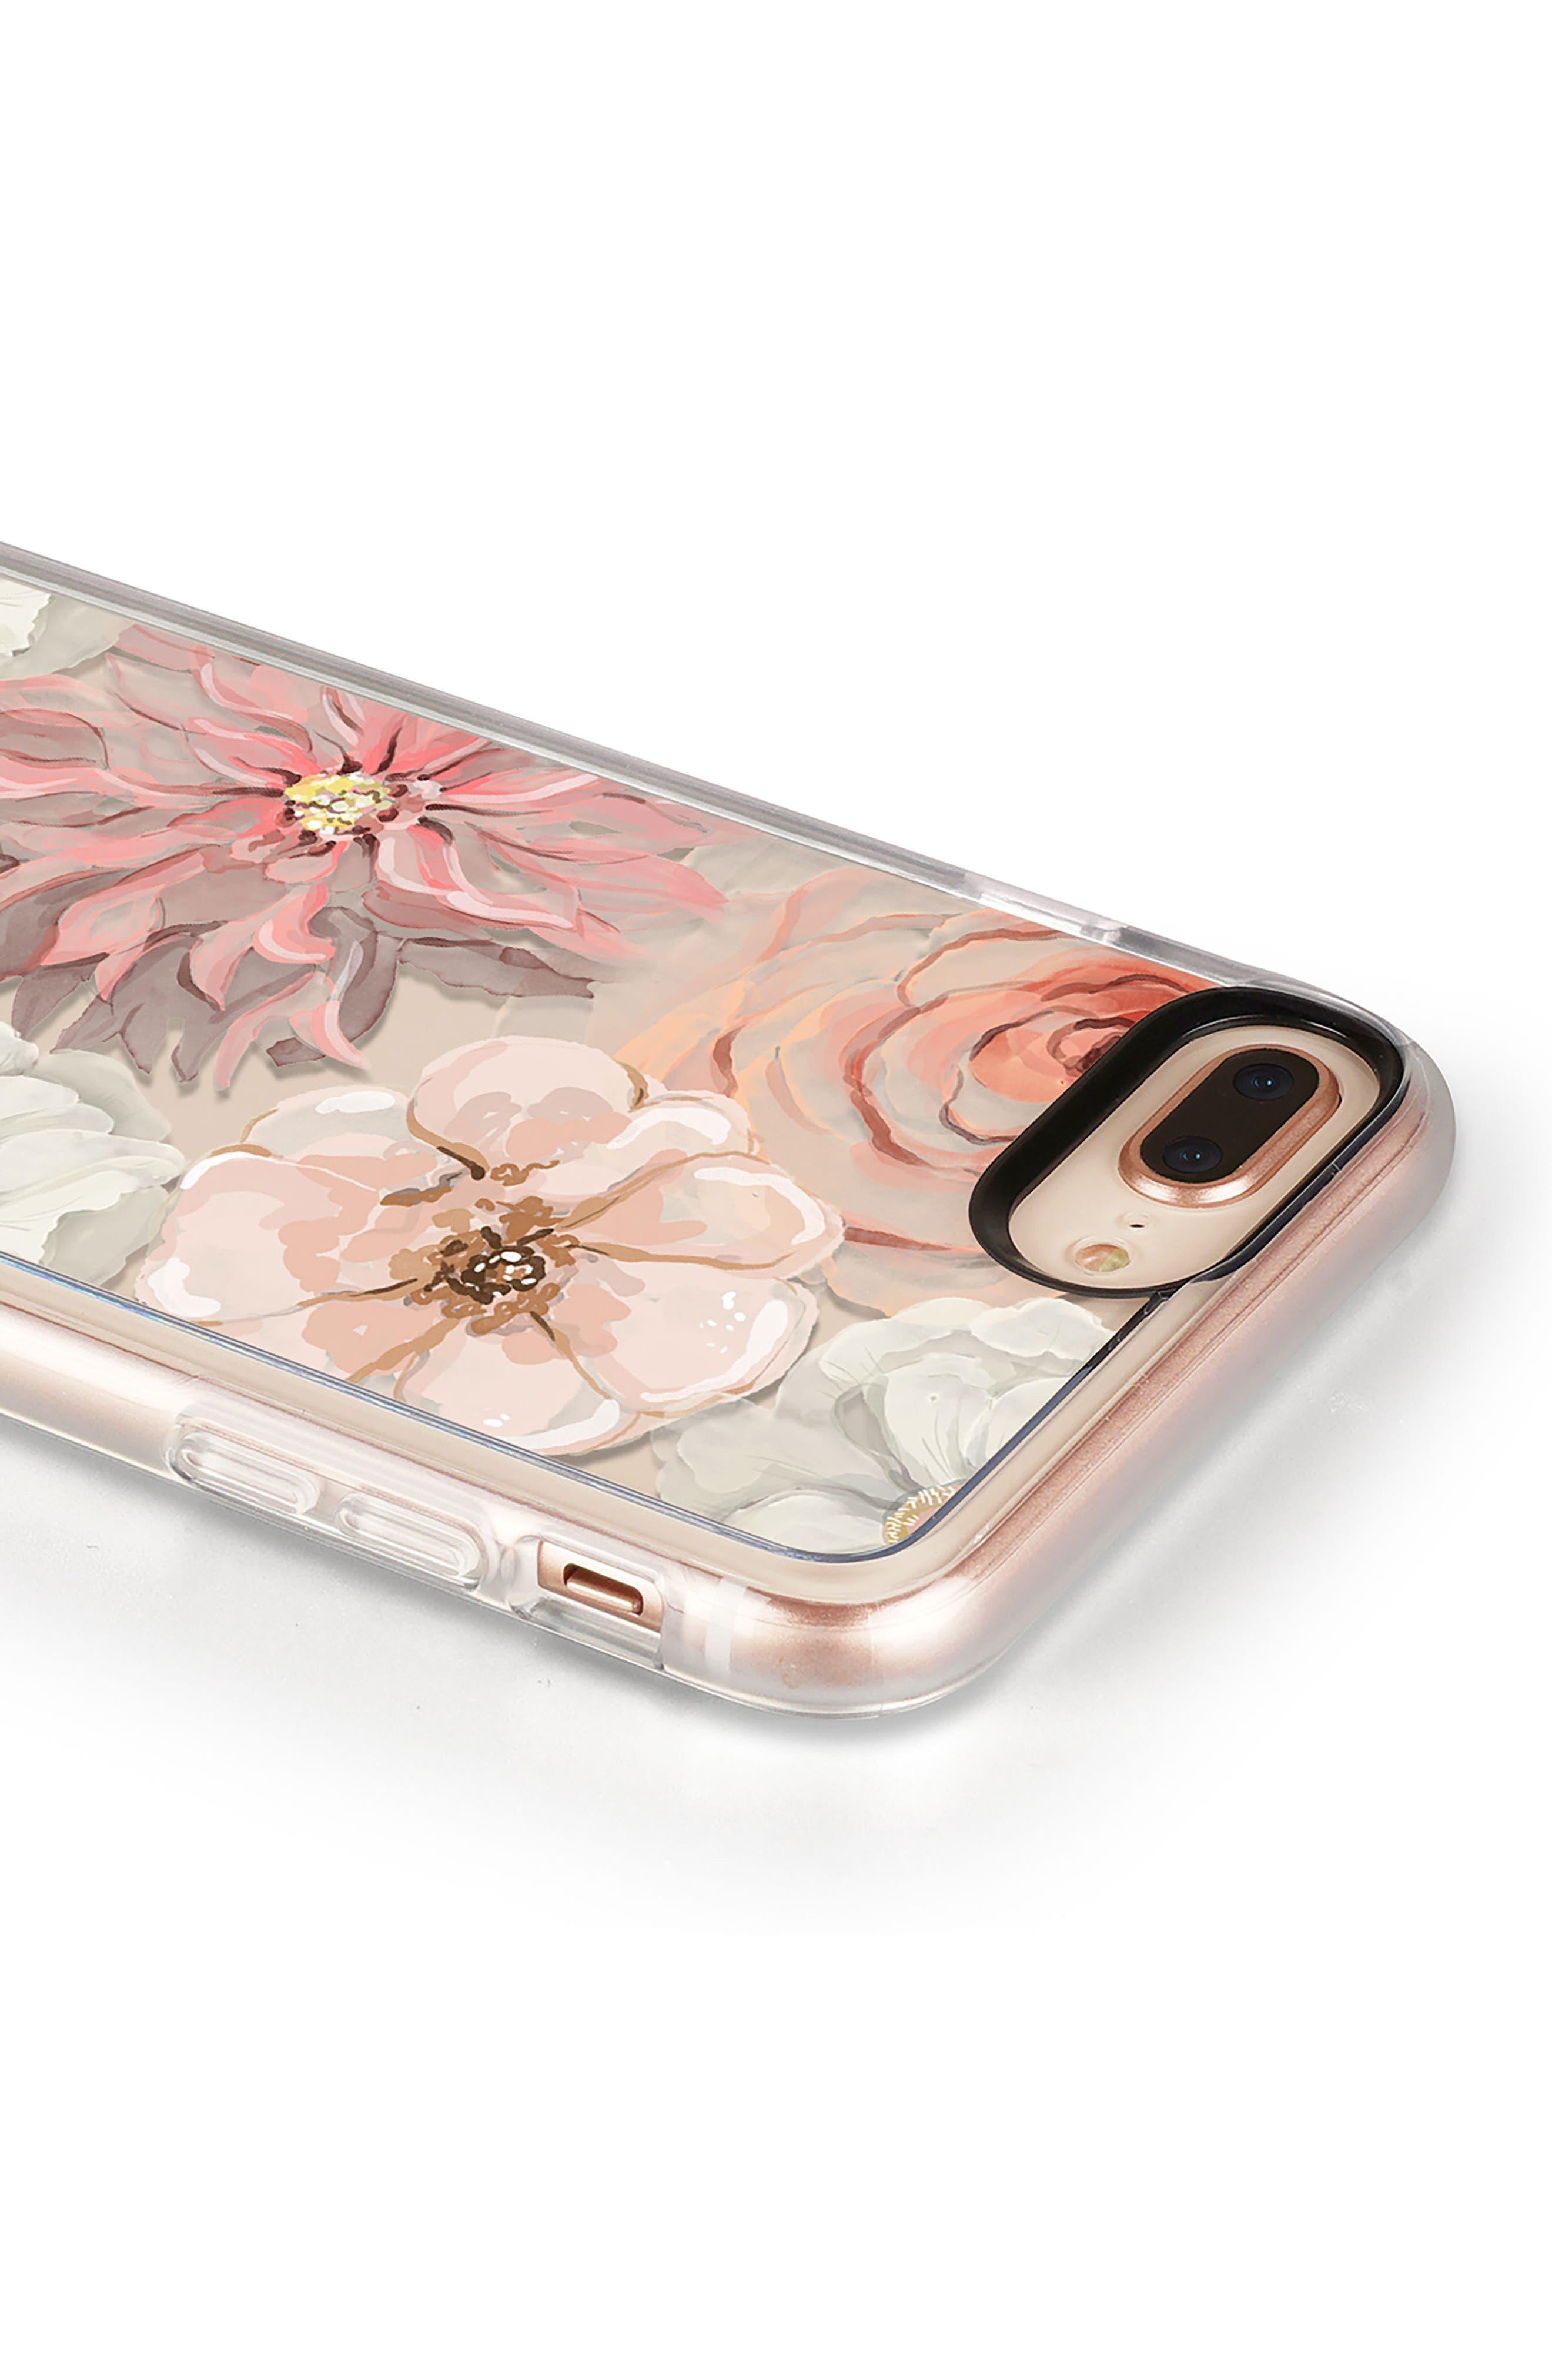 Pretty Blush iPhone 7/8 & 7/8 Plus Case,                             Alternate thumbnail 5, color,                             BLUSH PINK